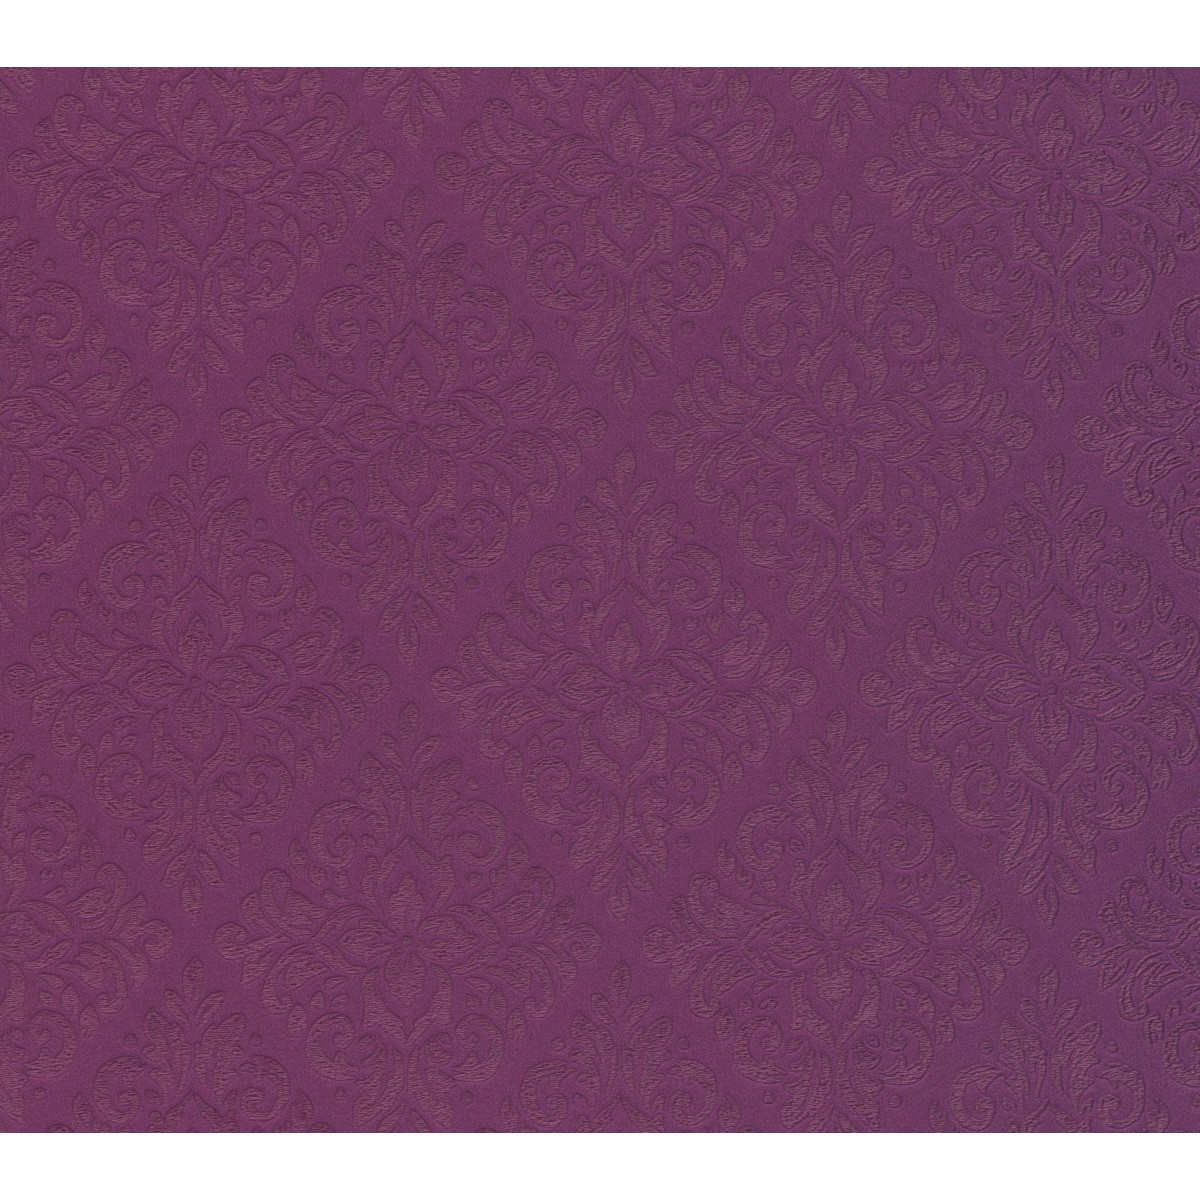 Обои флизелиновые Limonta Italian Wall Couture Camea фиолетовые 1.06 м 78005